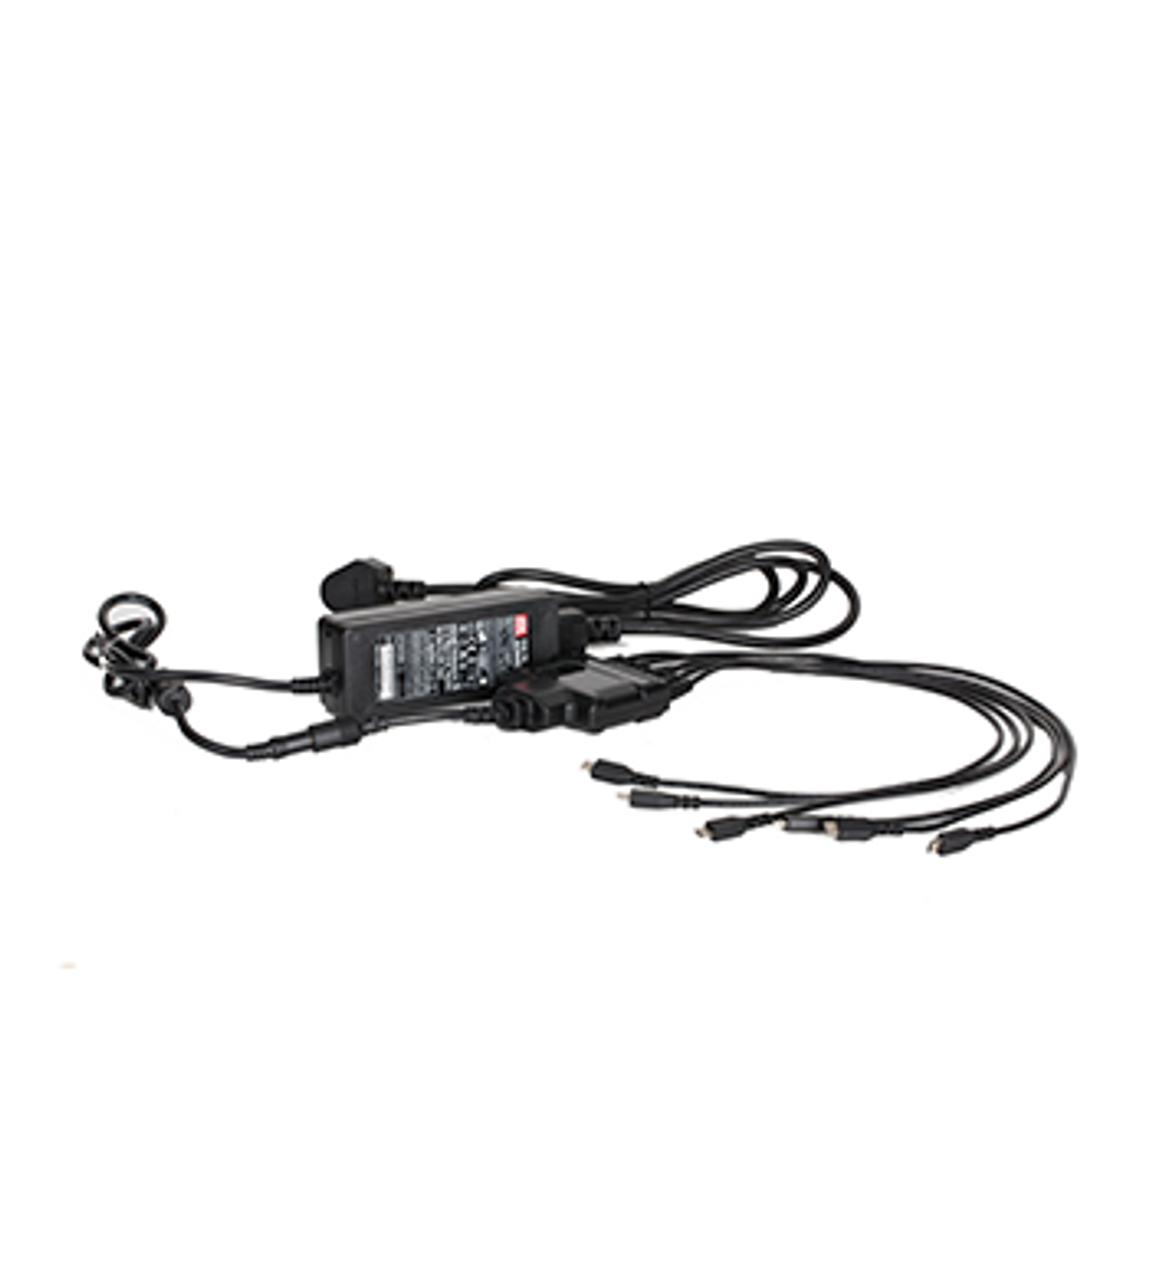 Hytera PS6001 6 Port Mini-USB Charging Port